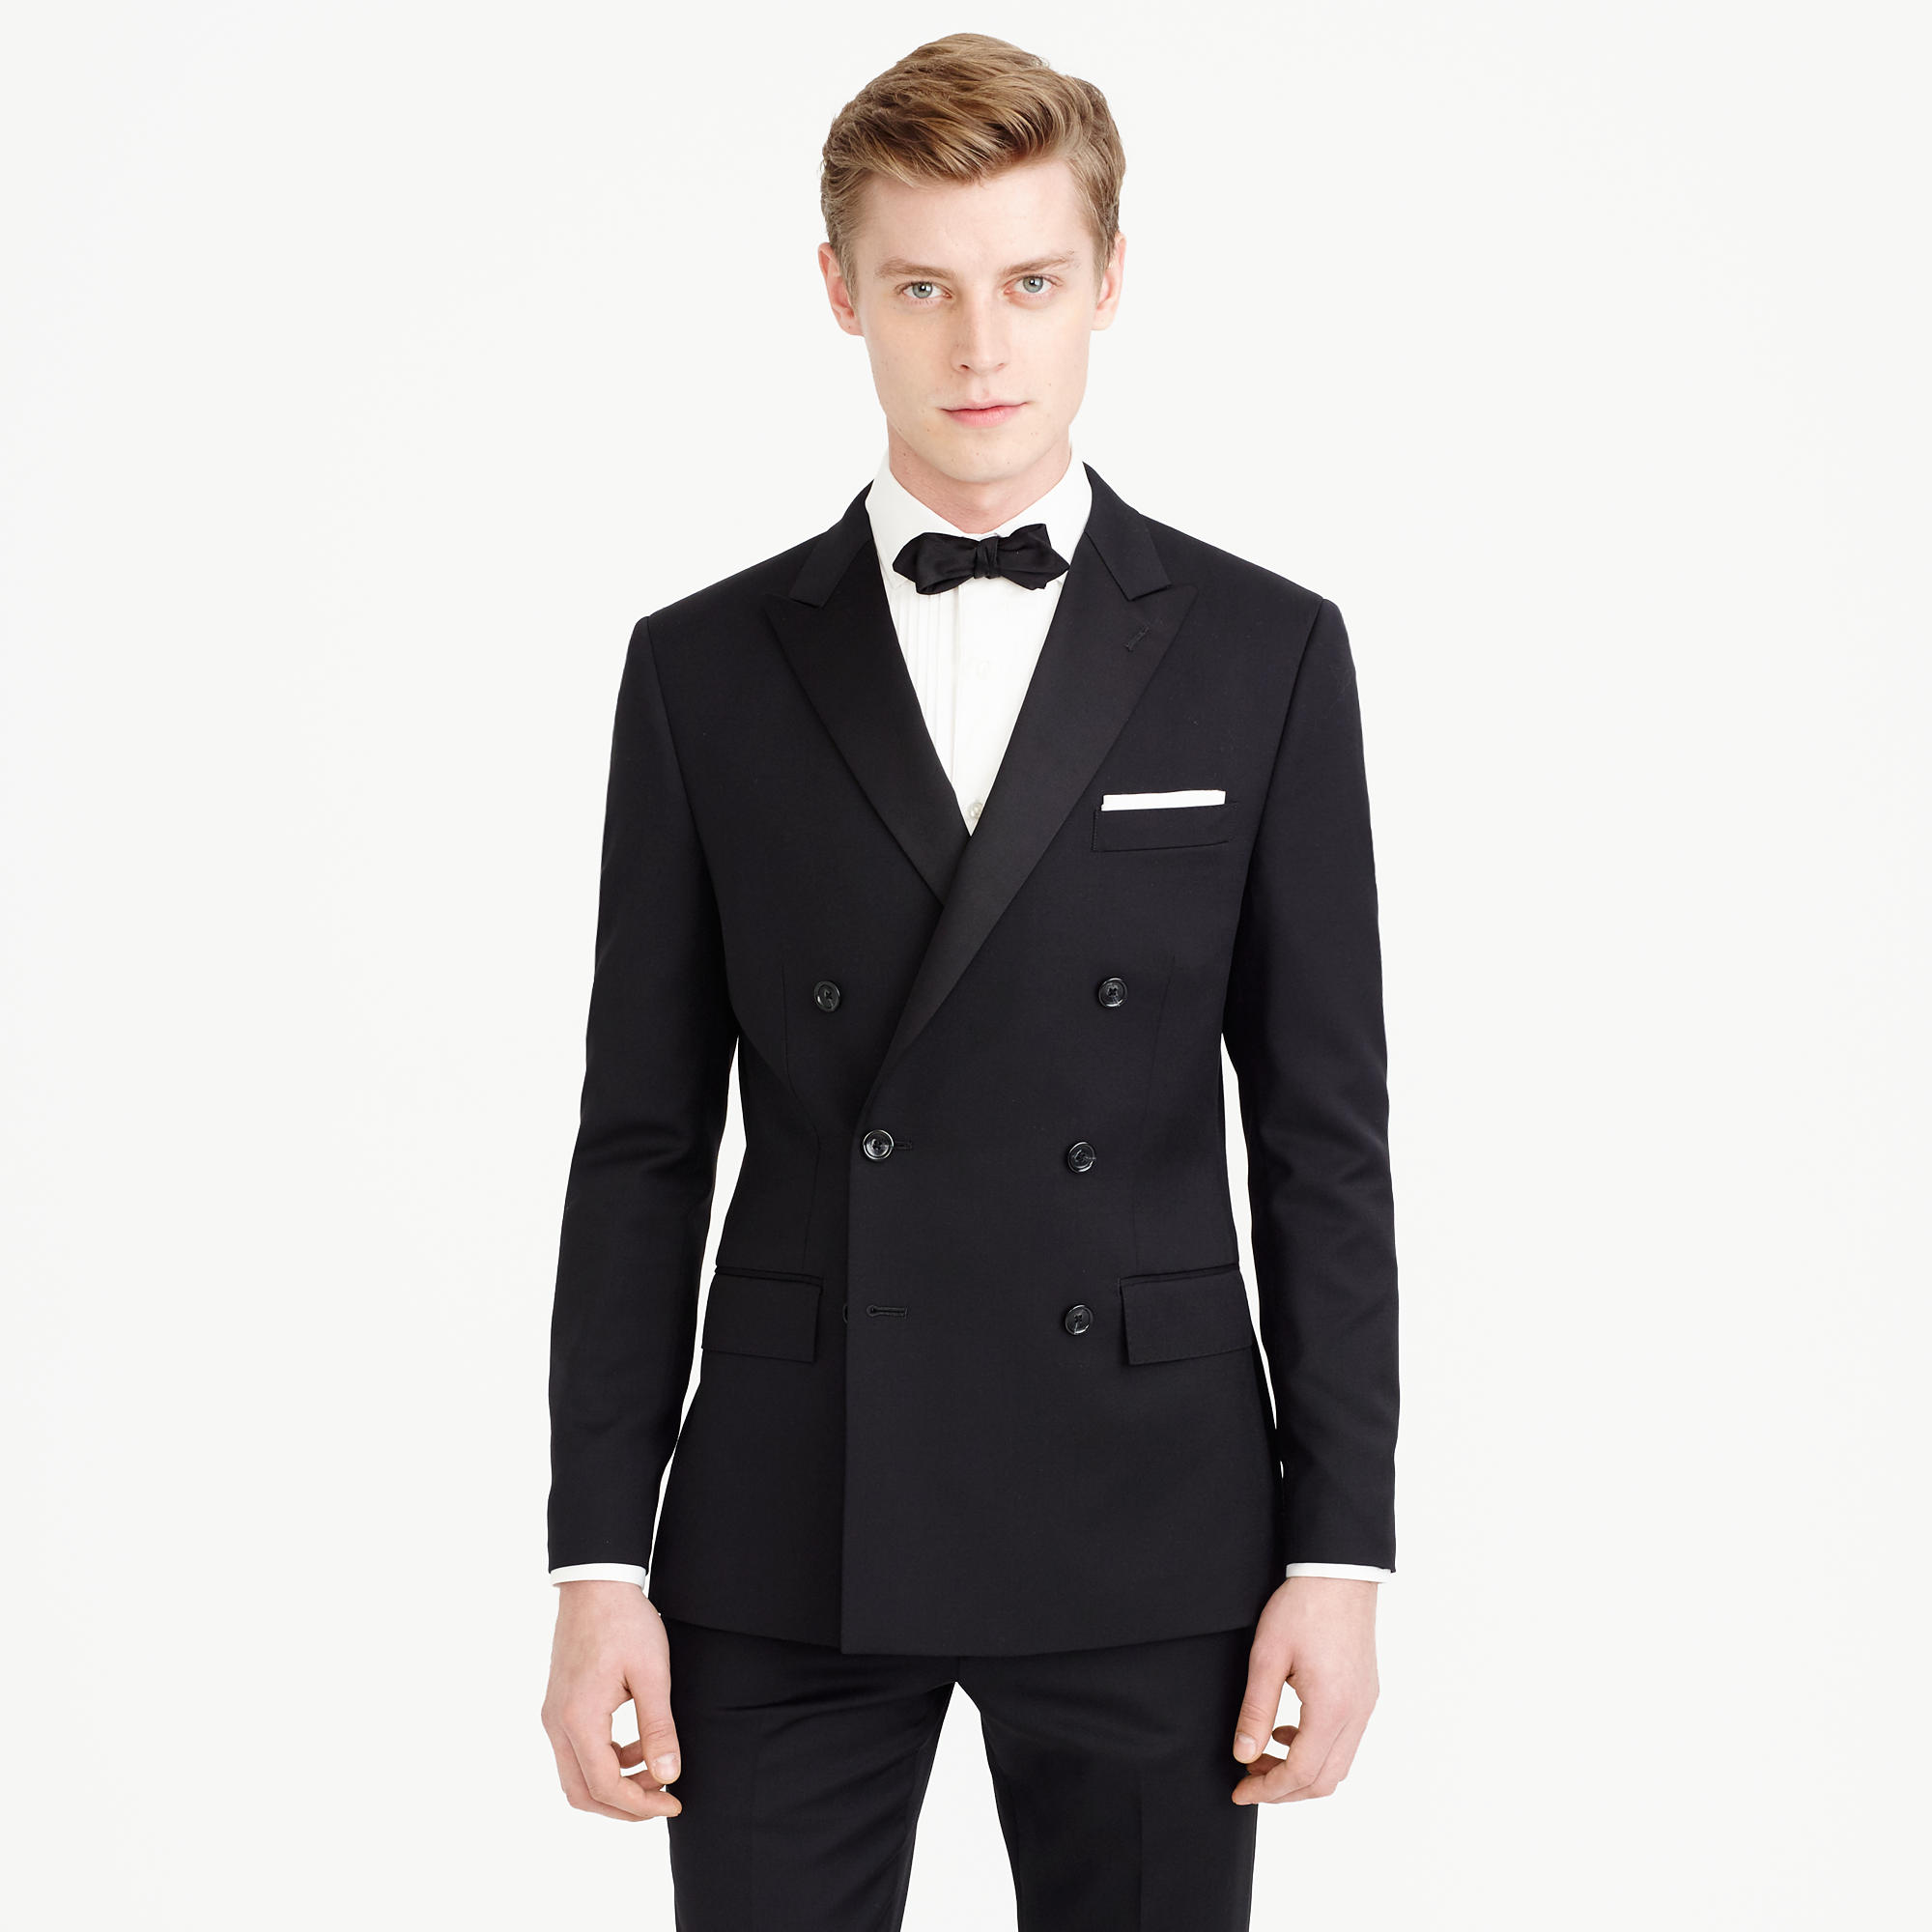 Men&39s Tuxedos &amp Formal Wear : Wedding &amp Tuxes | J.Crew